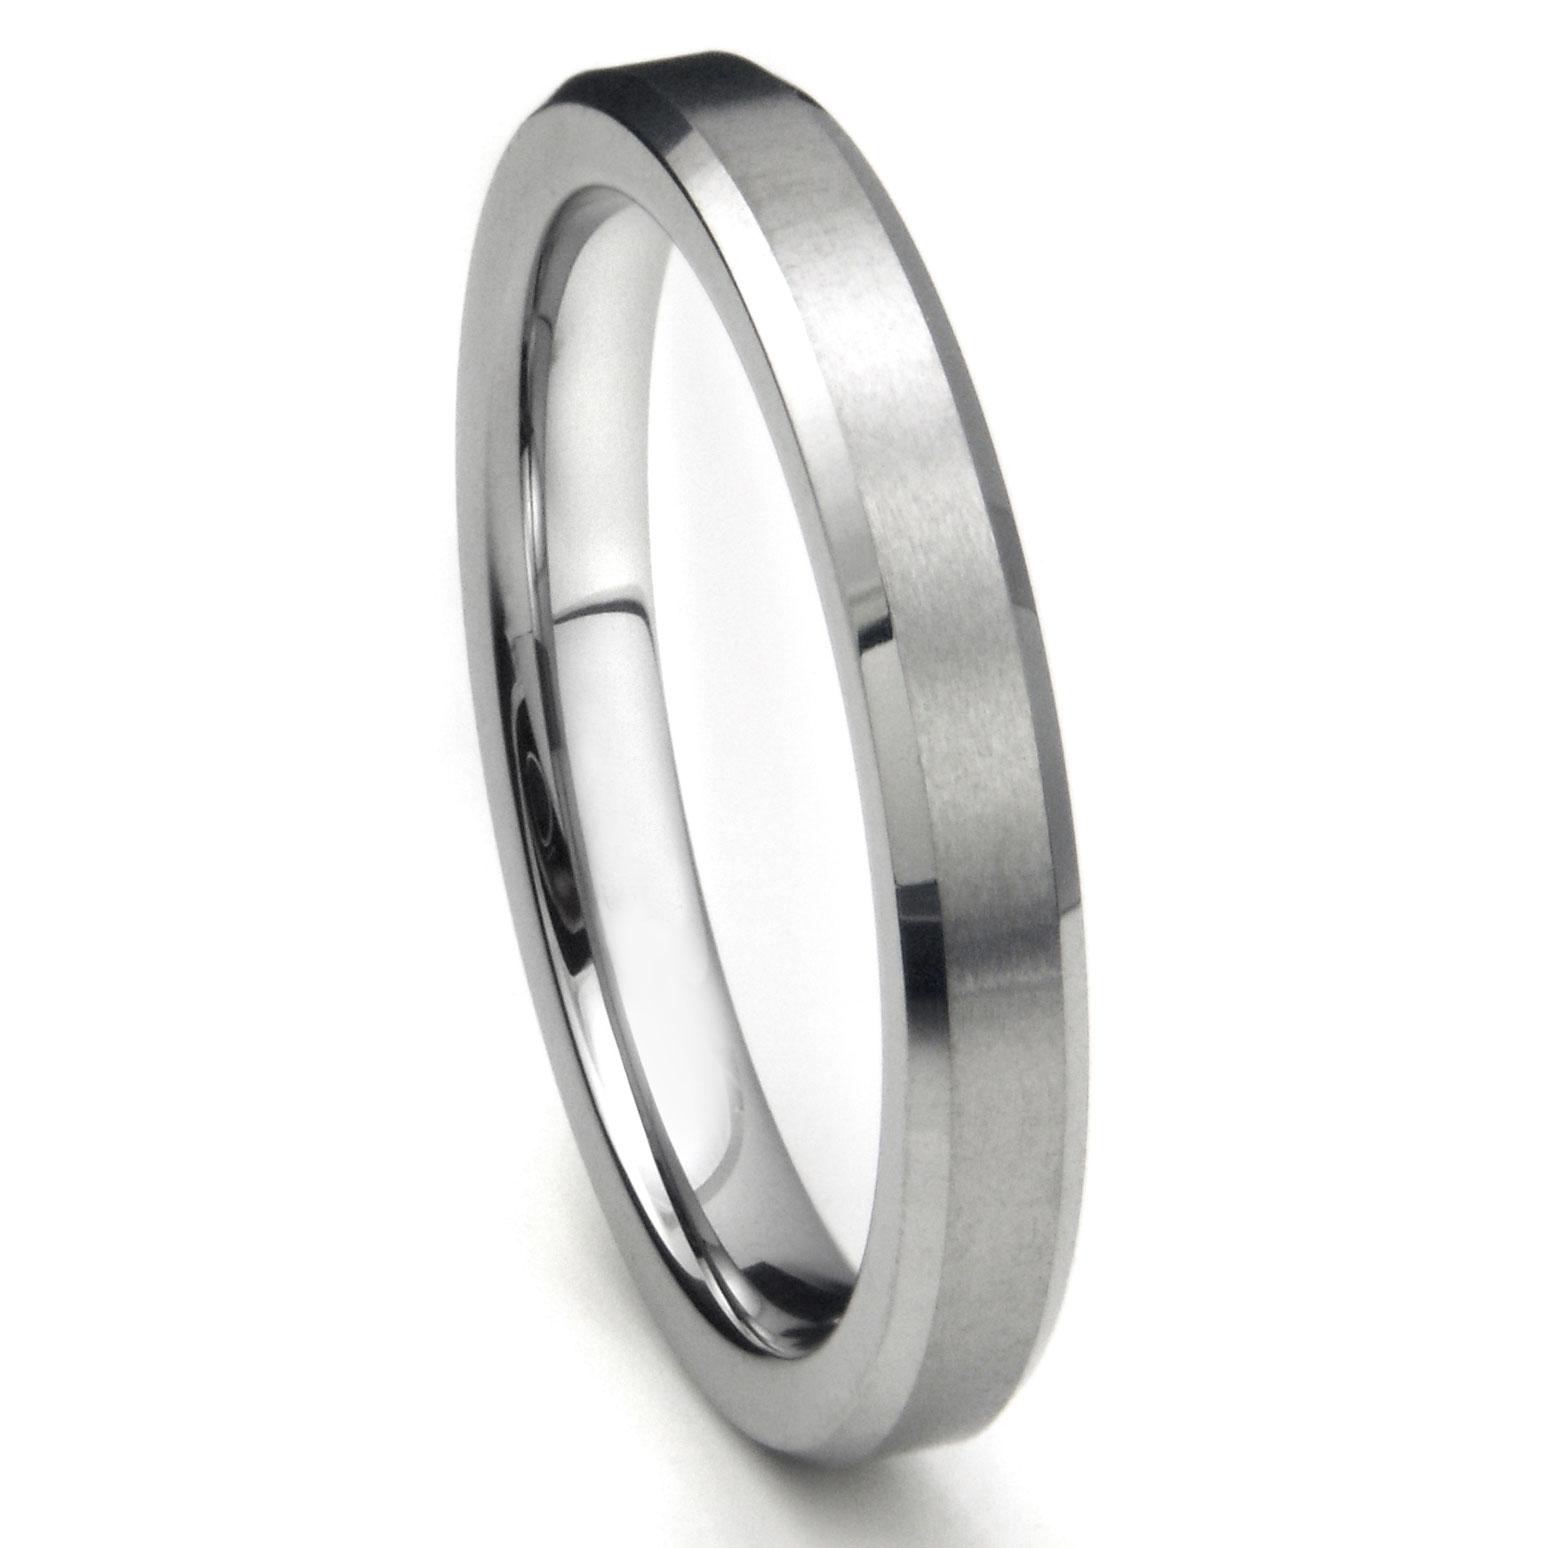 Tungsten Carbide 4MM Beveled Brush Finish Wedding Band Ring